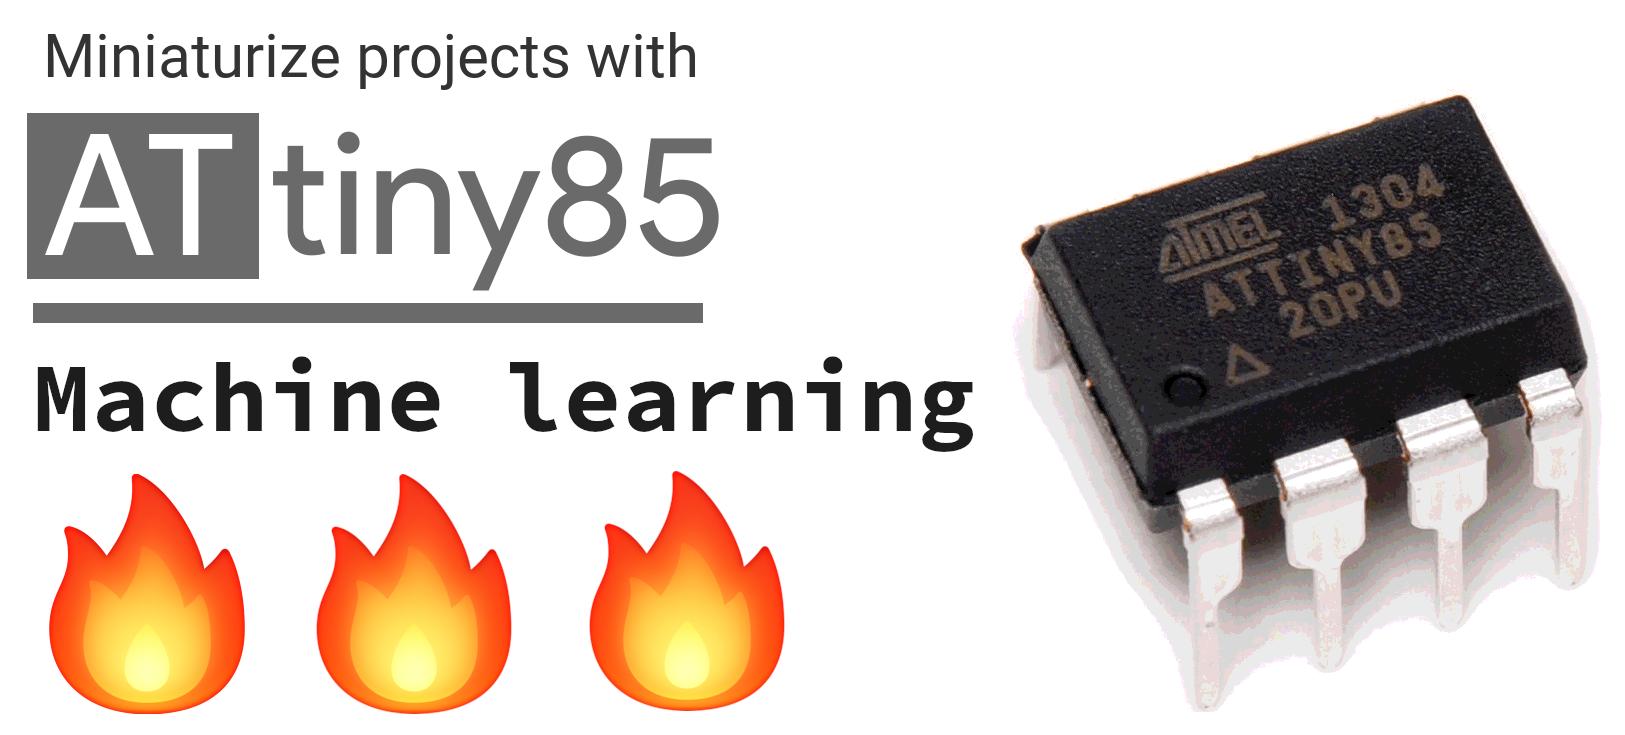 Embedded Machine learning on Attiny85